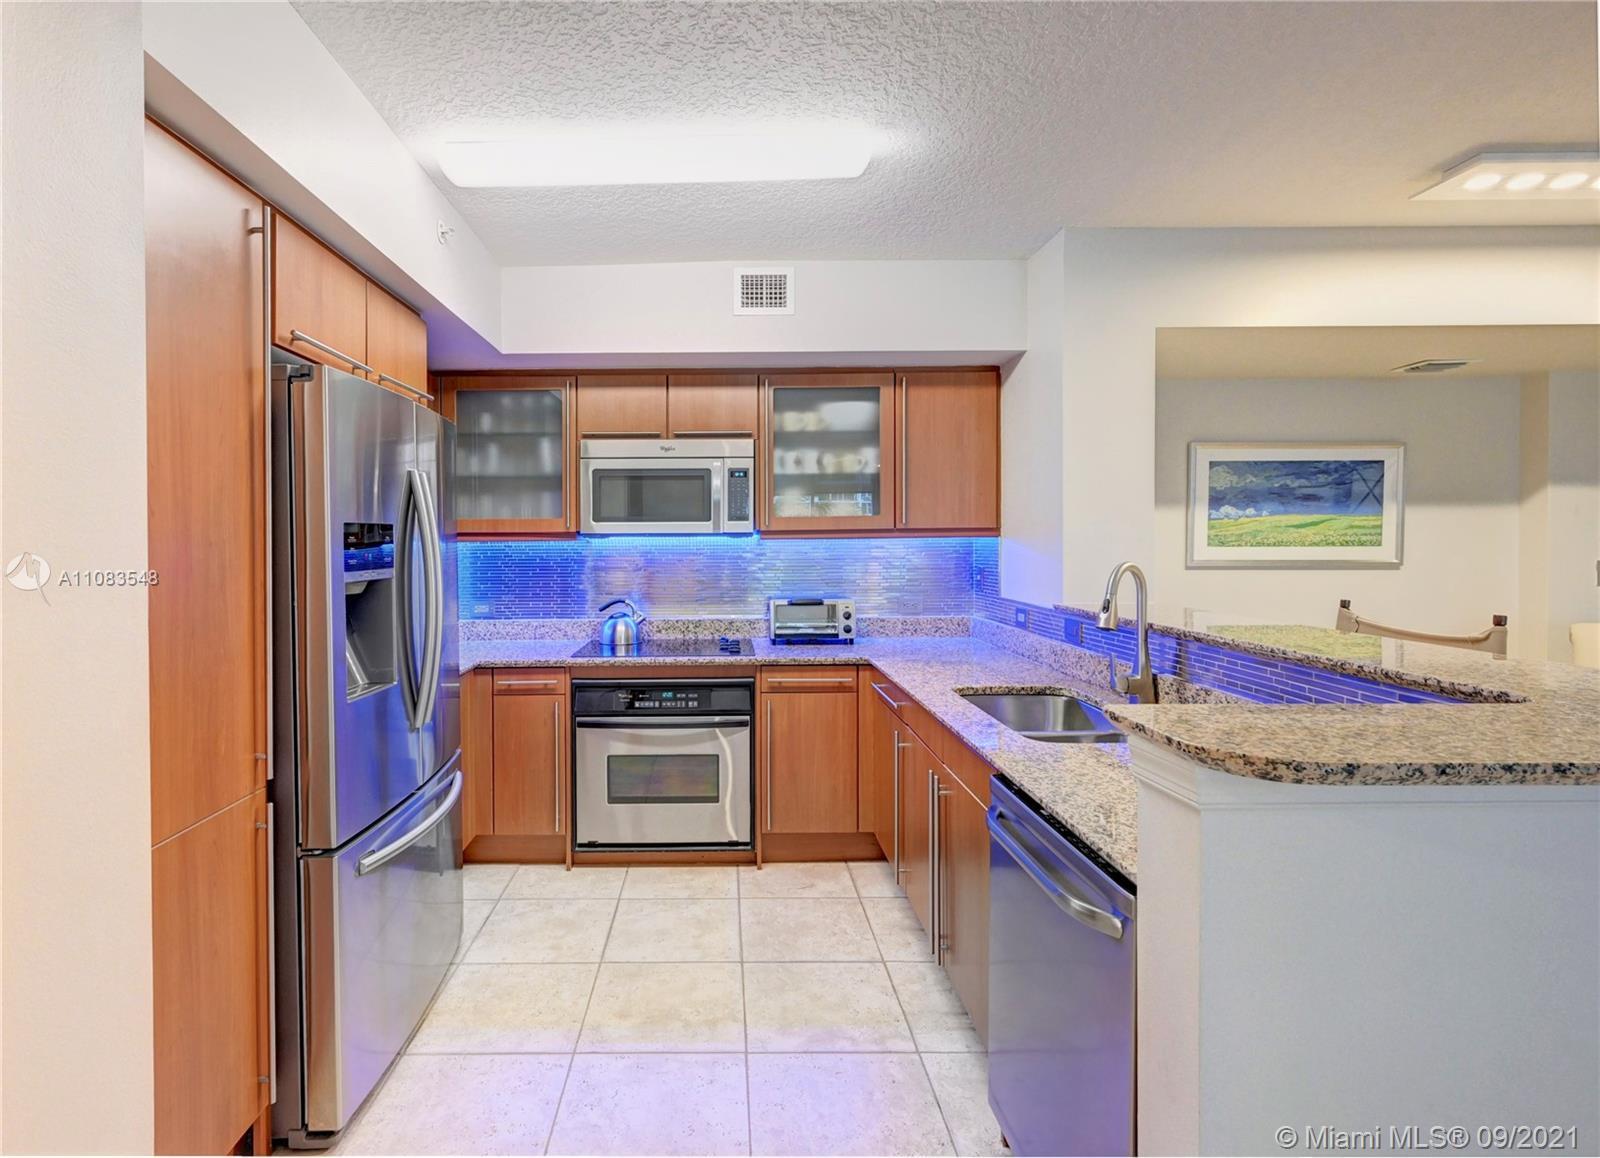 2080 Hallandale #304 - 2080 S Ocean Dr #304, Hallandale Beach, FL 33009